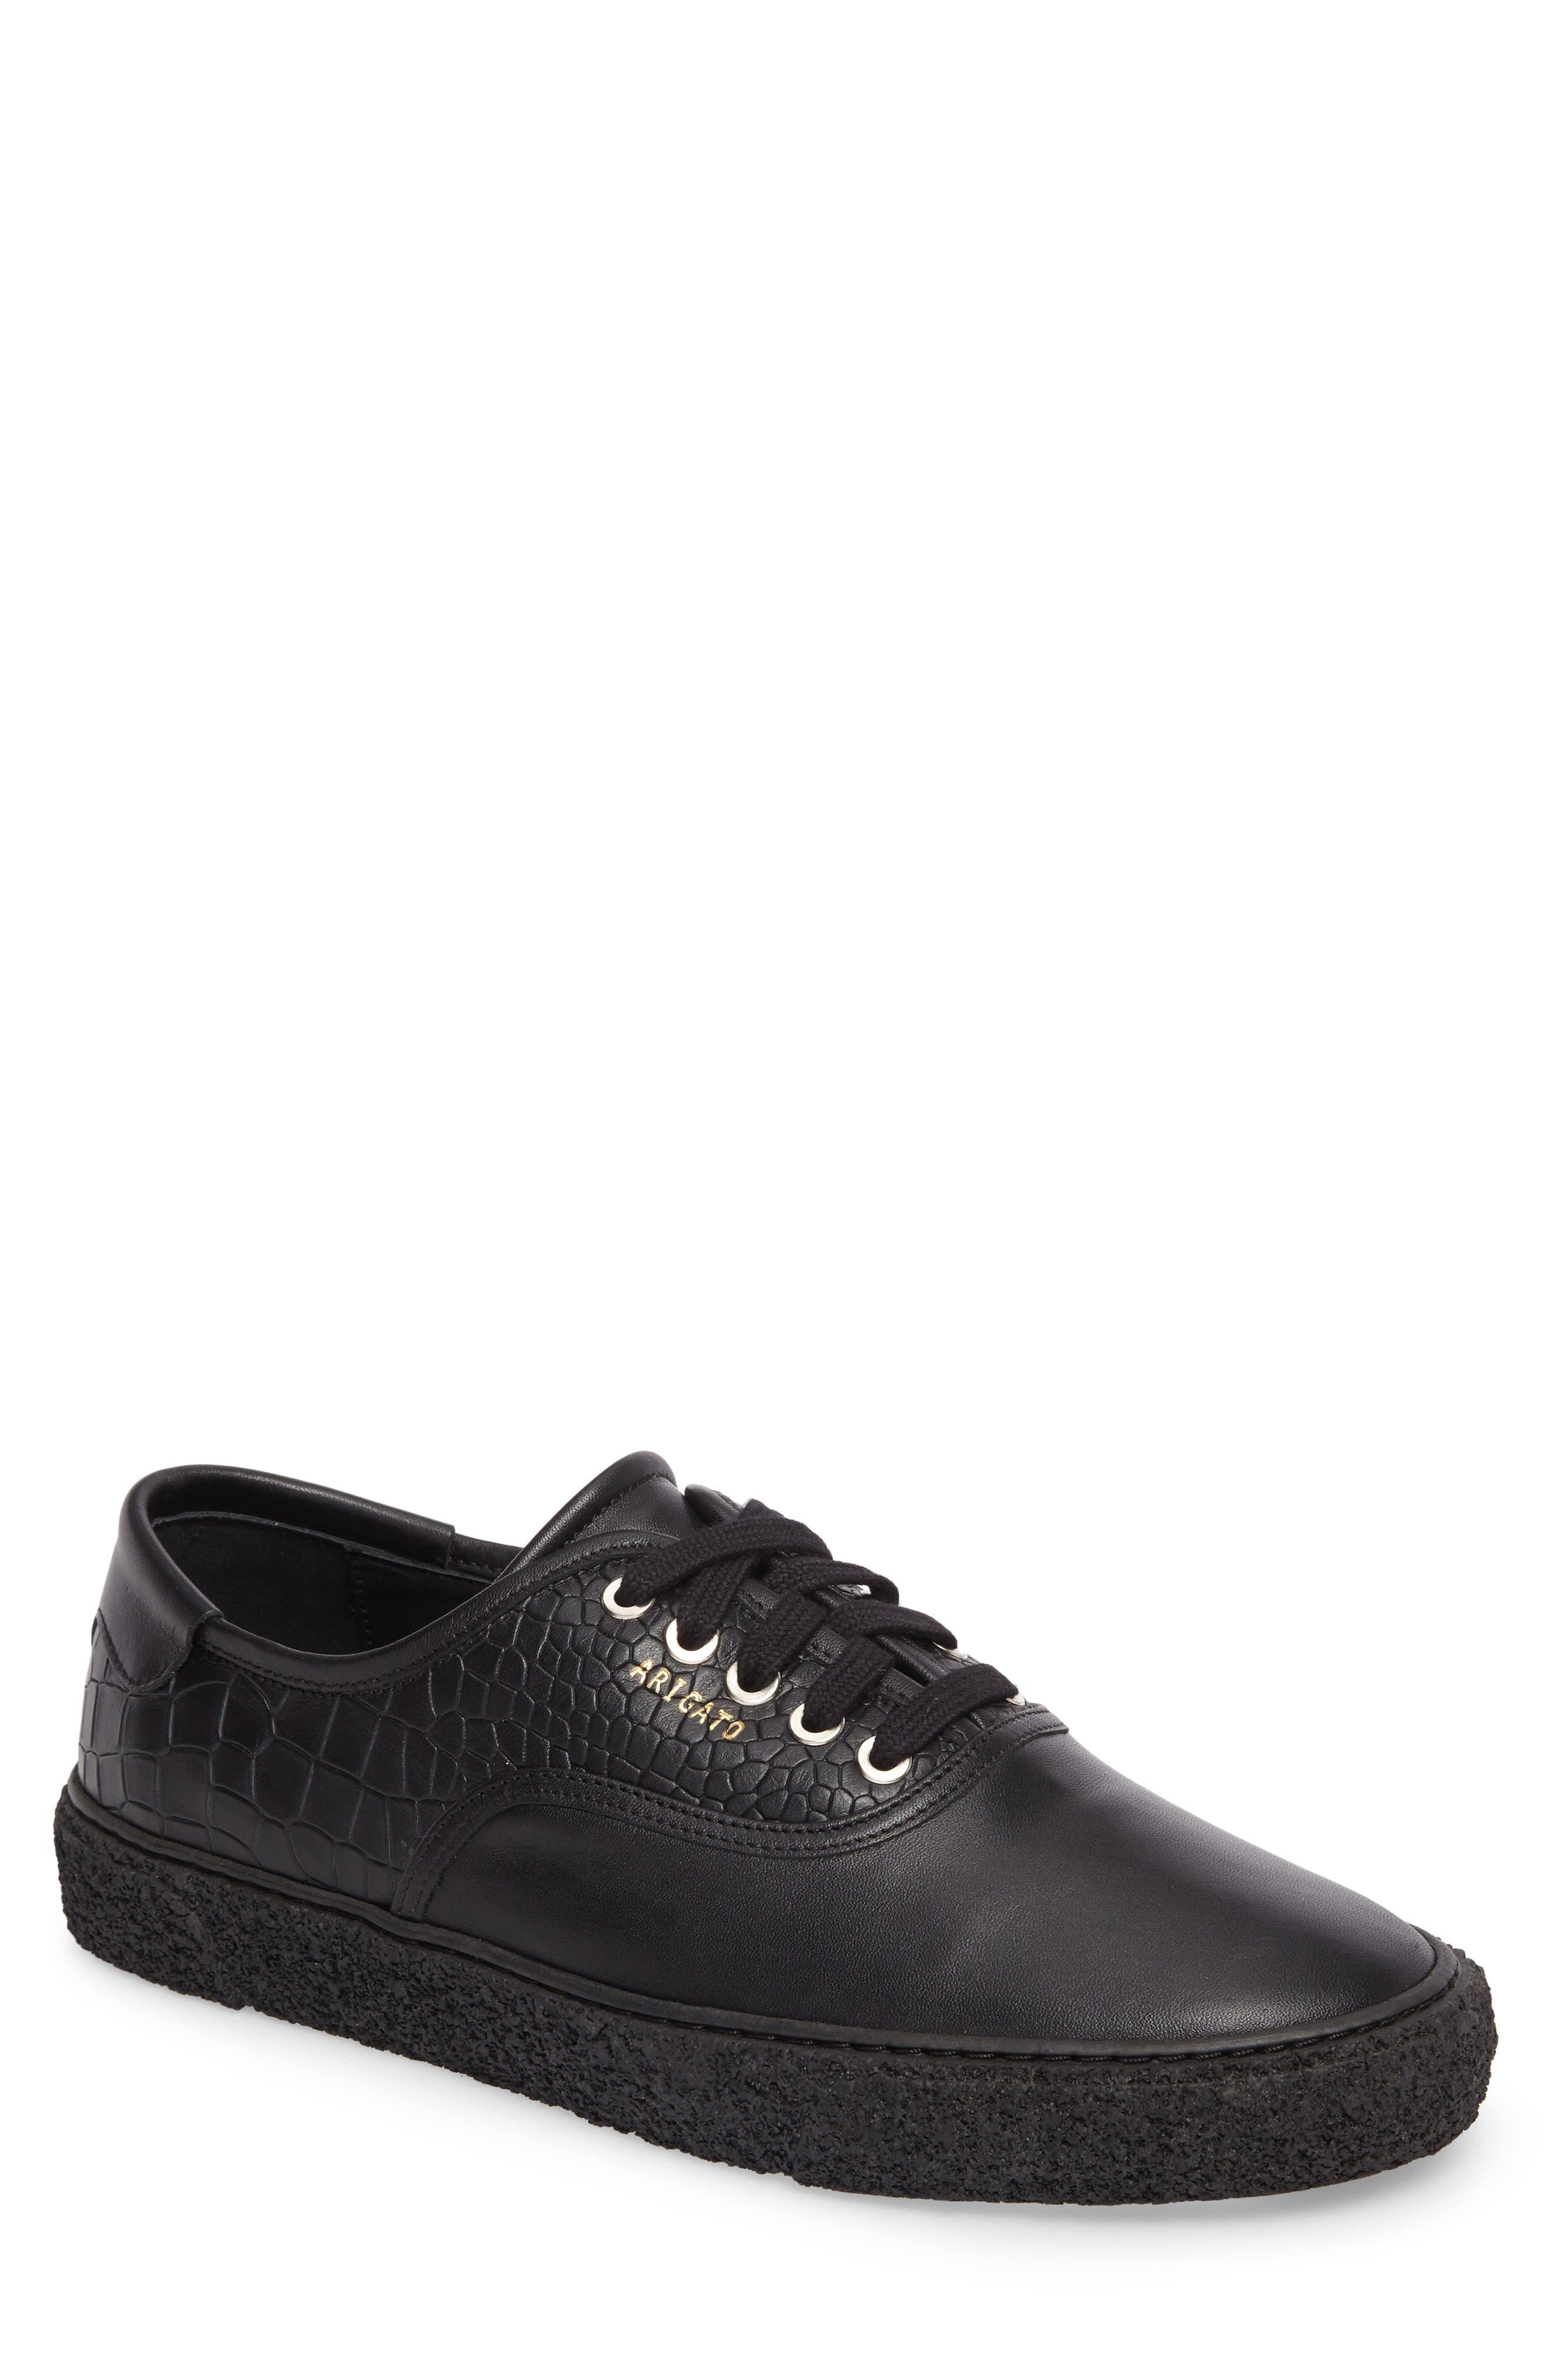 Skate Embossed Sneaker,                             Main thumbnail 1, color,                             Black Leather